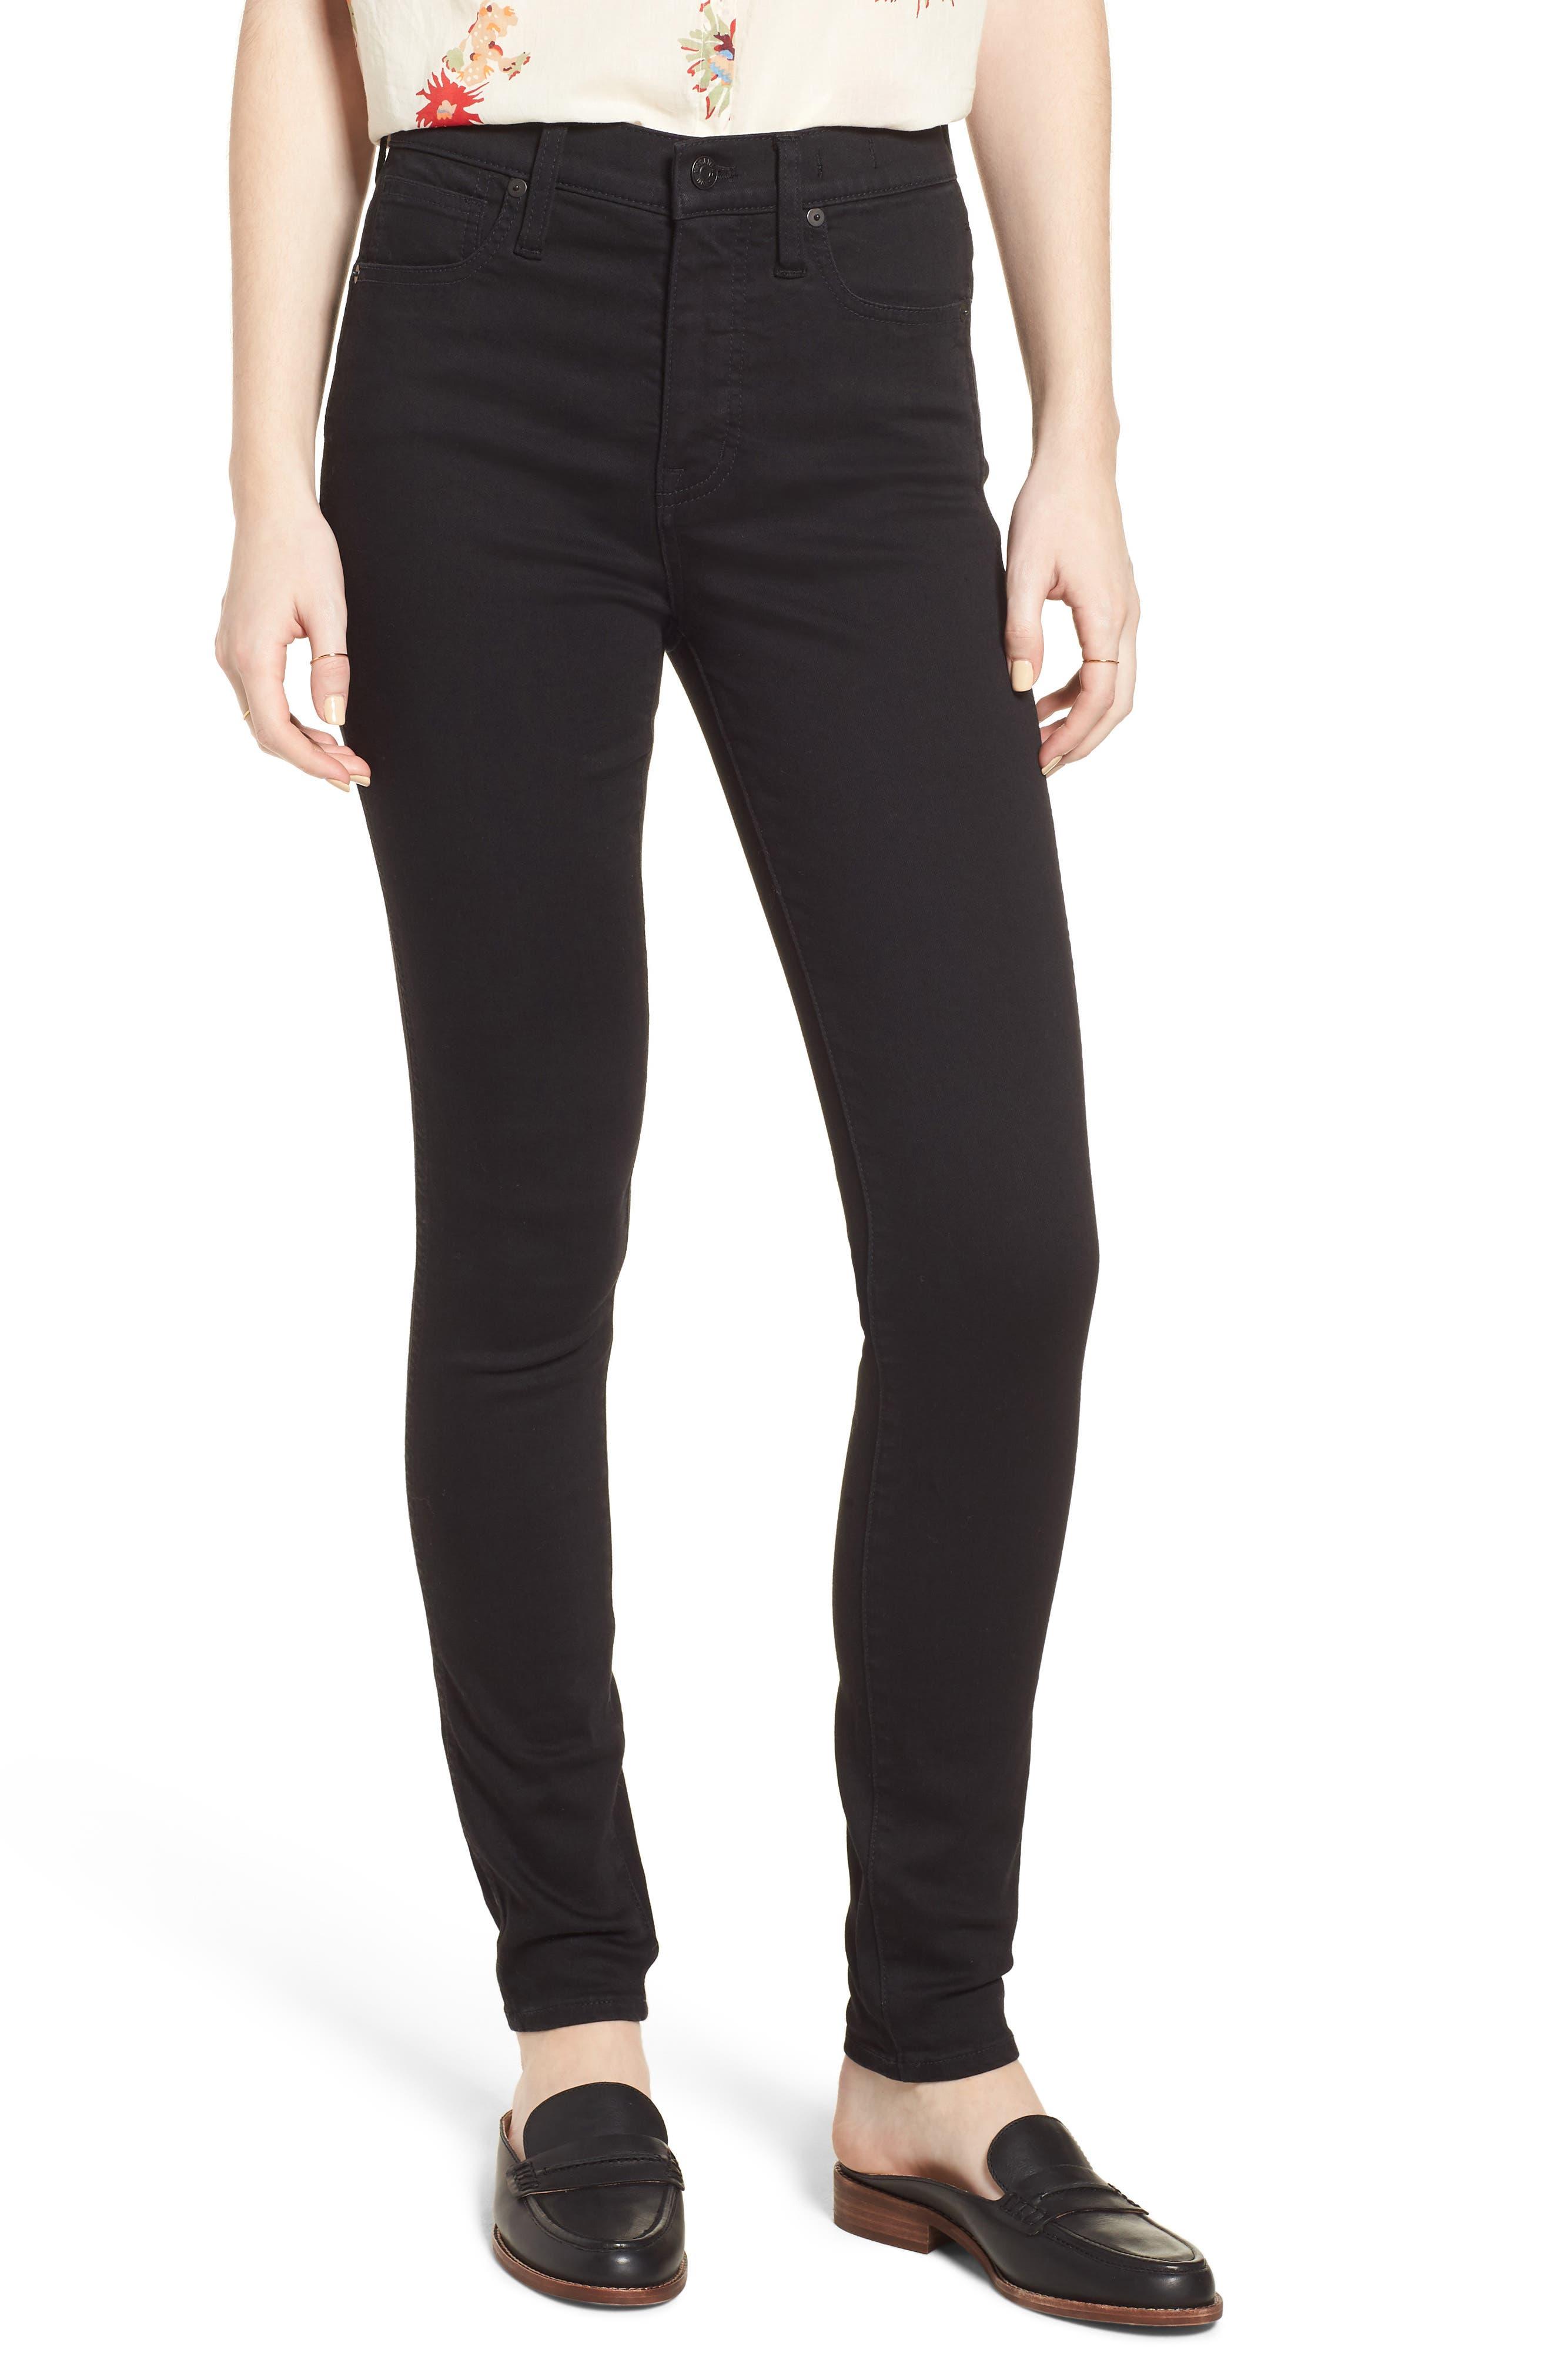 MADEWELL 10-Inch High Waist Skinny Jeans, Main, color, 001